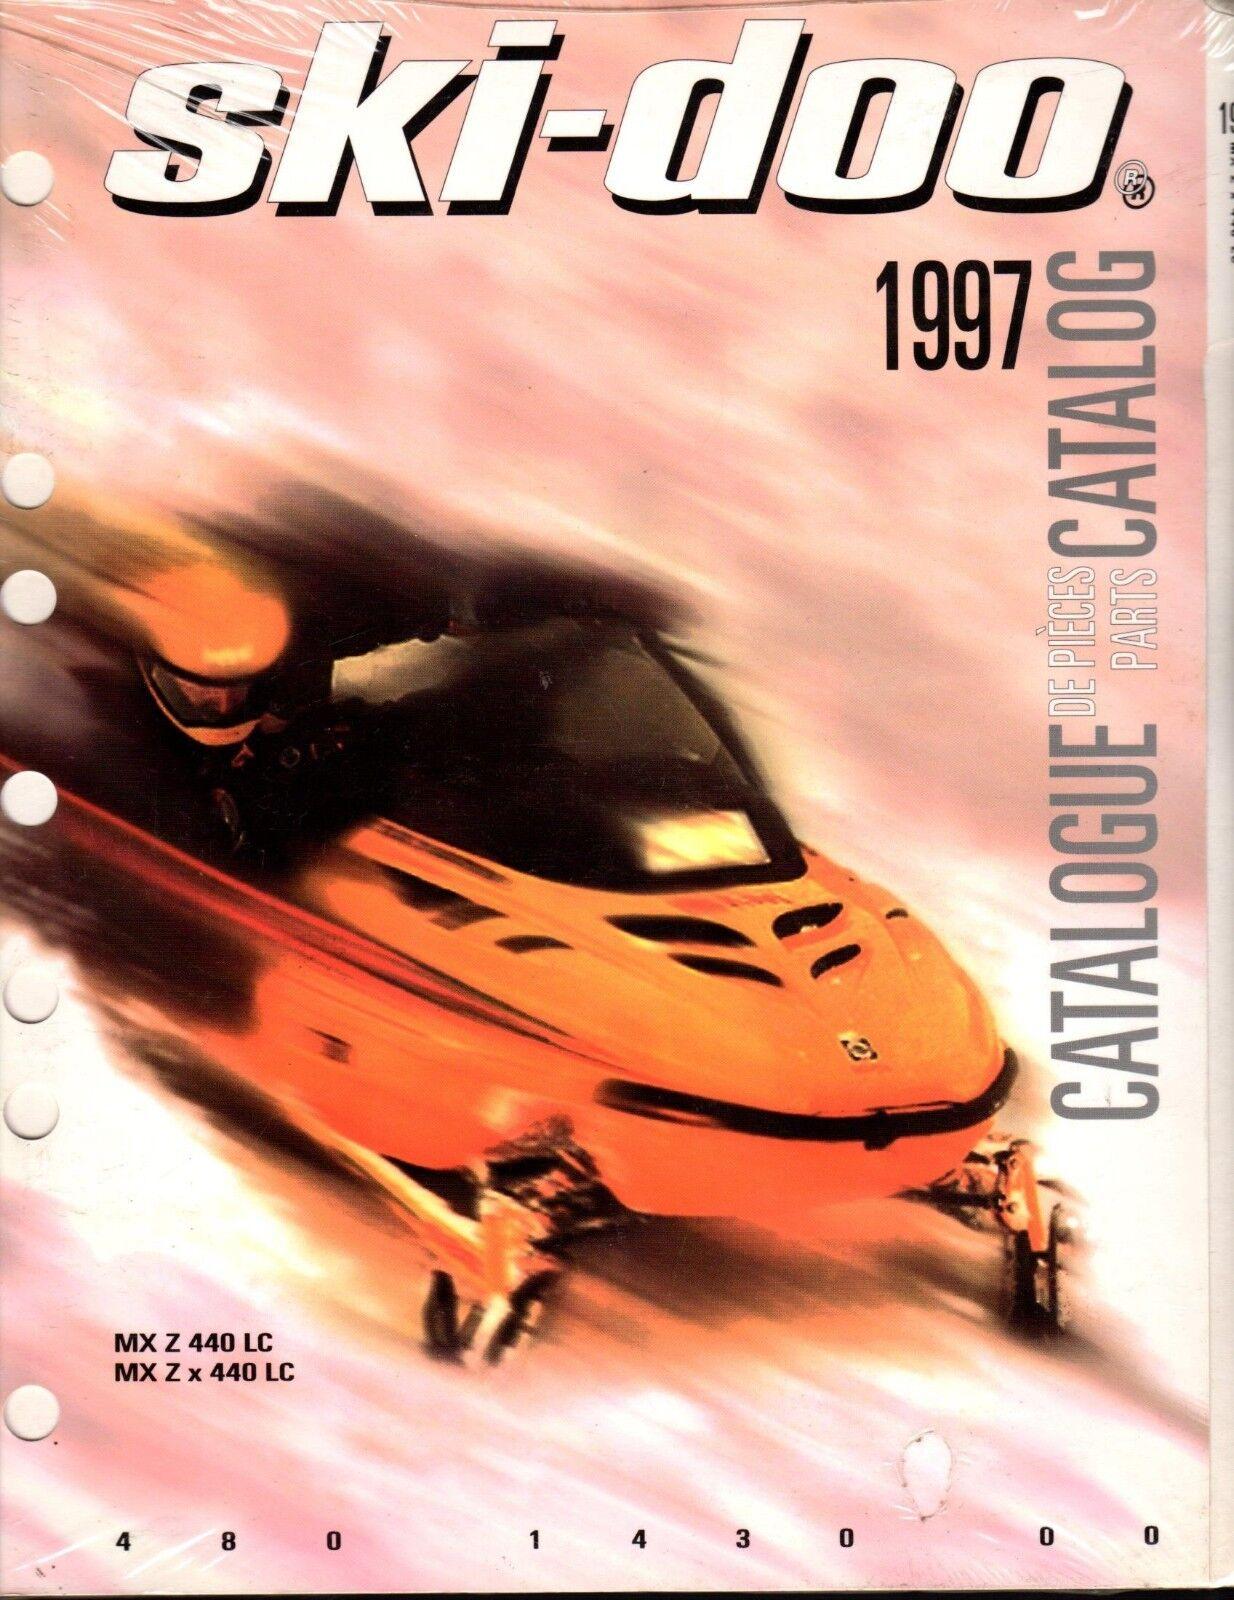 1997 SKI-DOO MX Z 440 LC & MX Z X 440 LC  PARTS MANUAL P N 480 1430 00  (419)